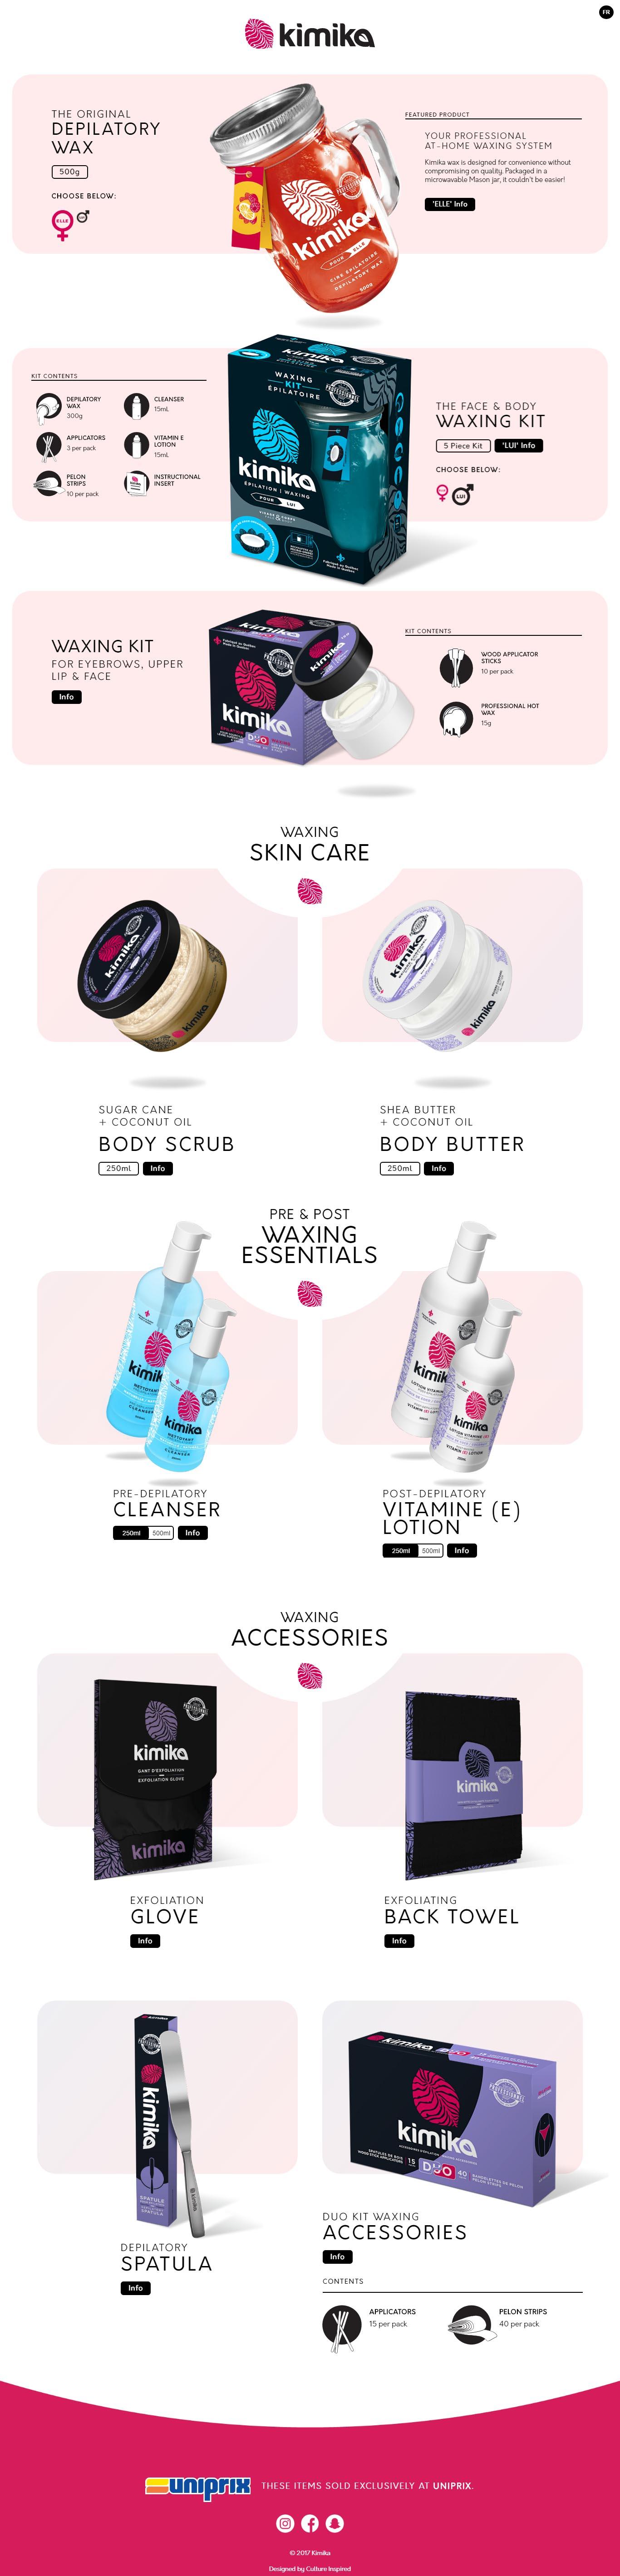 Kimika Beauty Pro Web Design Example